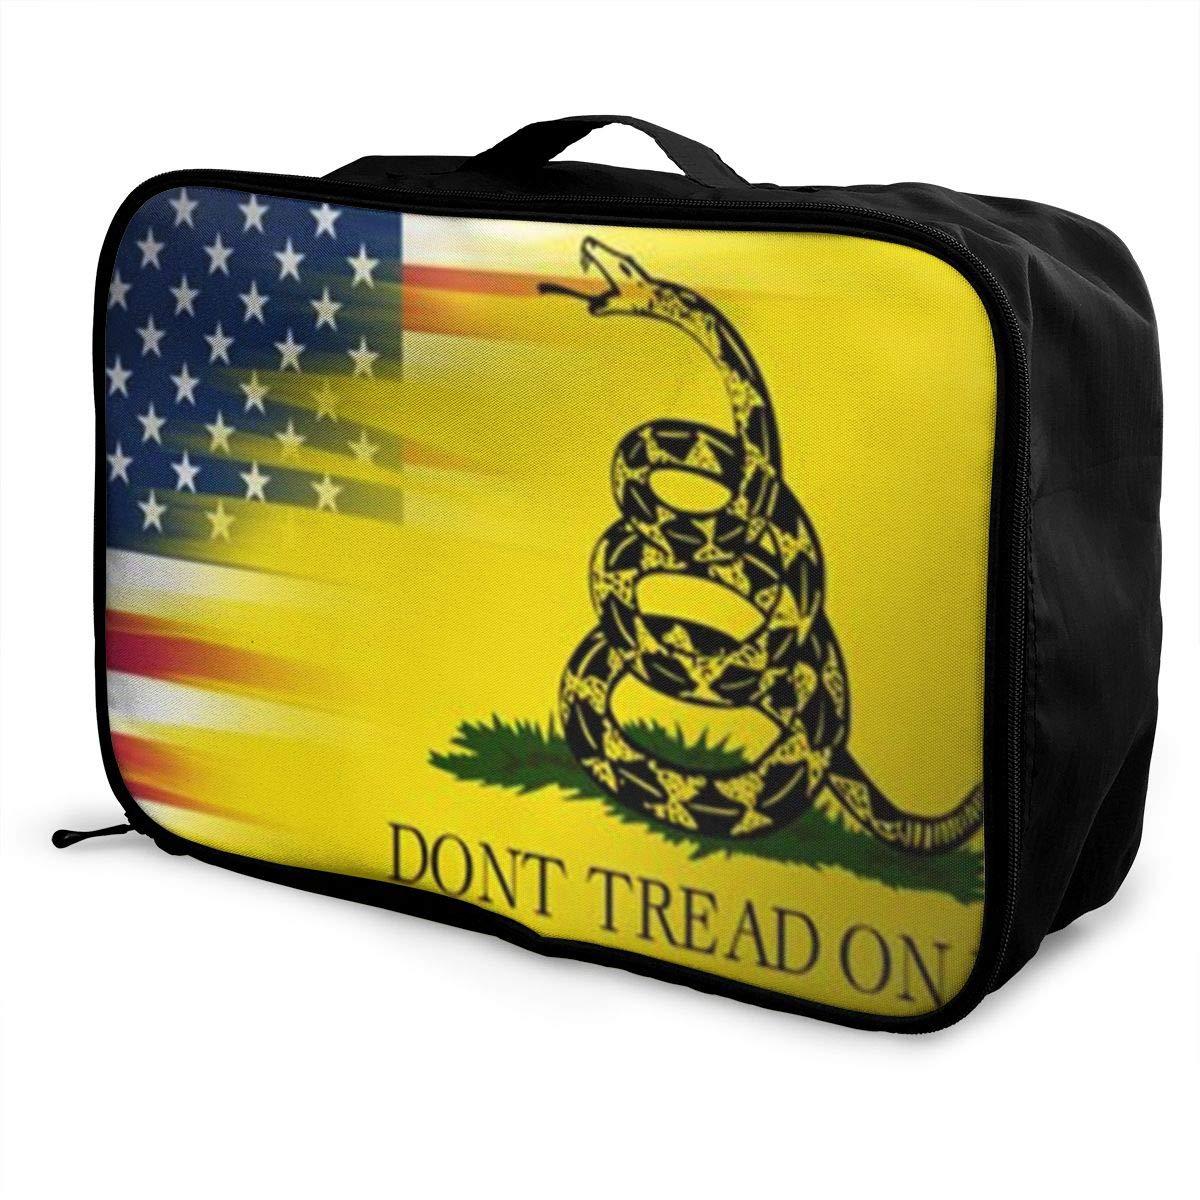 Unisex Travel Duffel Bag Waterproof Fashion Lightweight Large Capacity Portable Luggage Bag Dont Tread On Me American Flag